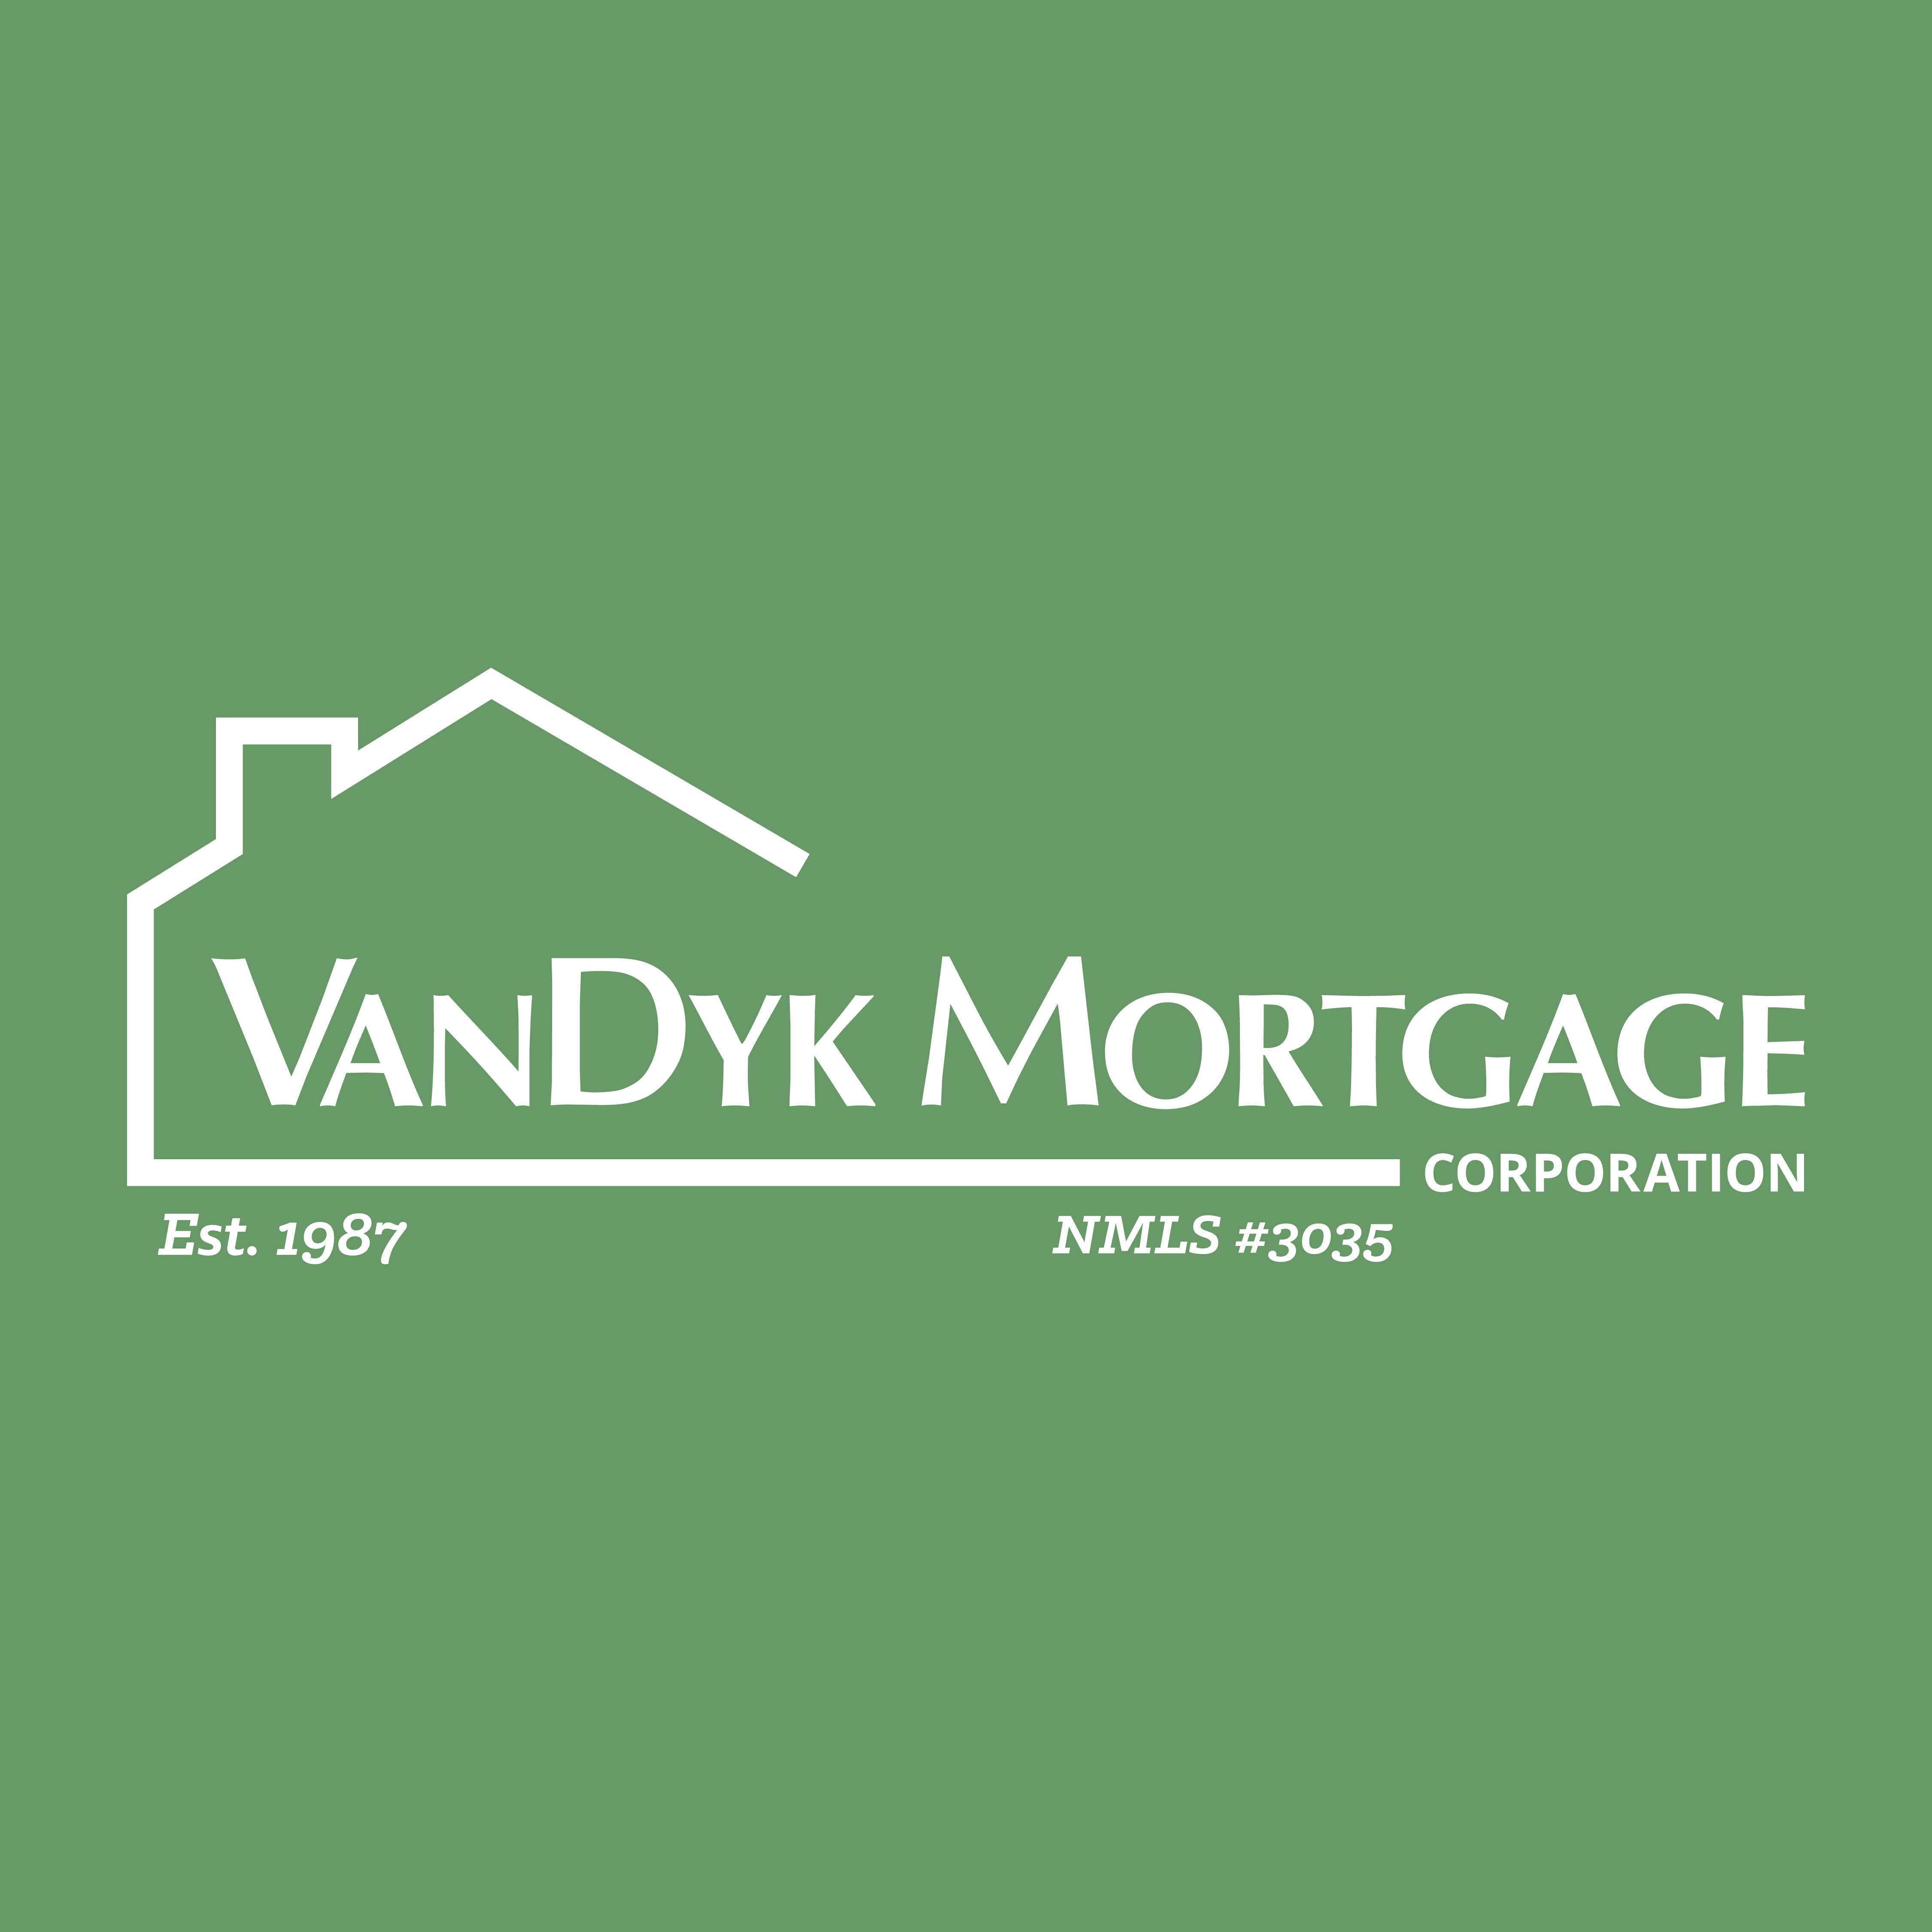 VanDyk Mortgage Corporation